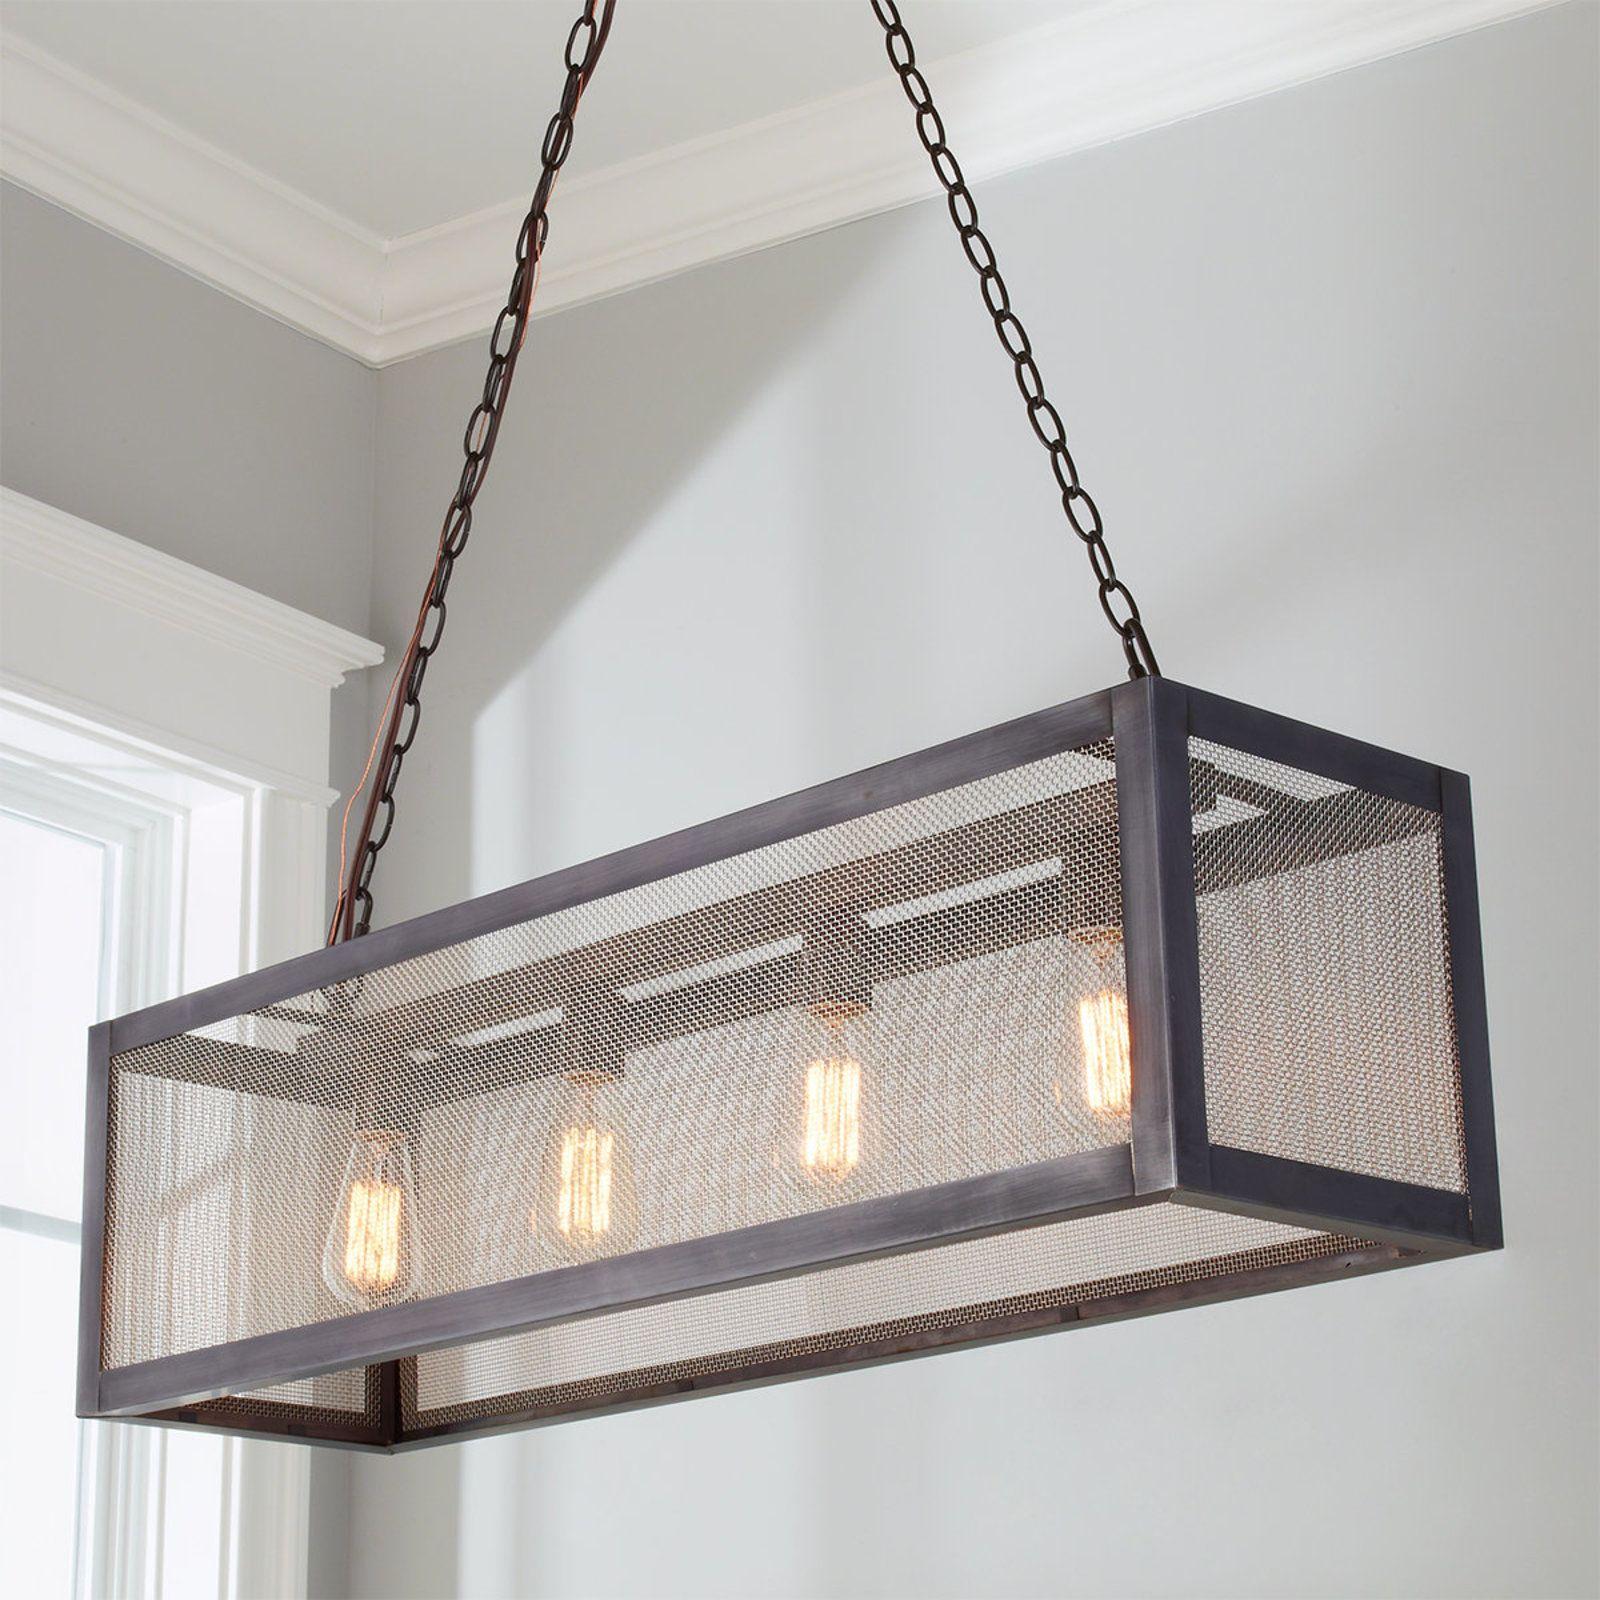 loft restoring lamp chandelier new ways chandeliers ancient lighting creative pendant industrial in item personality wind american lights restaurant from